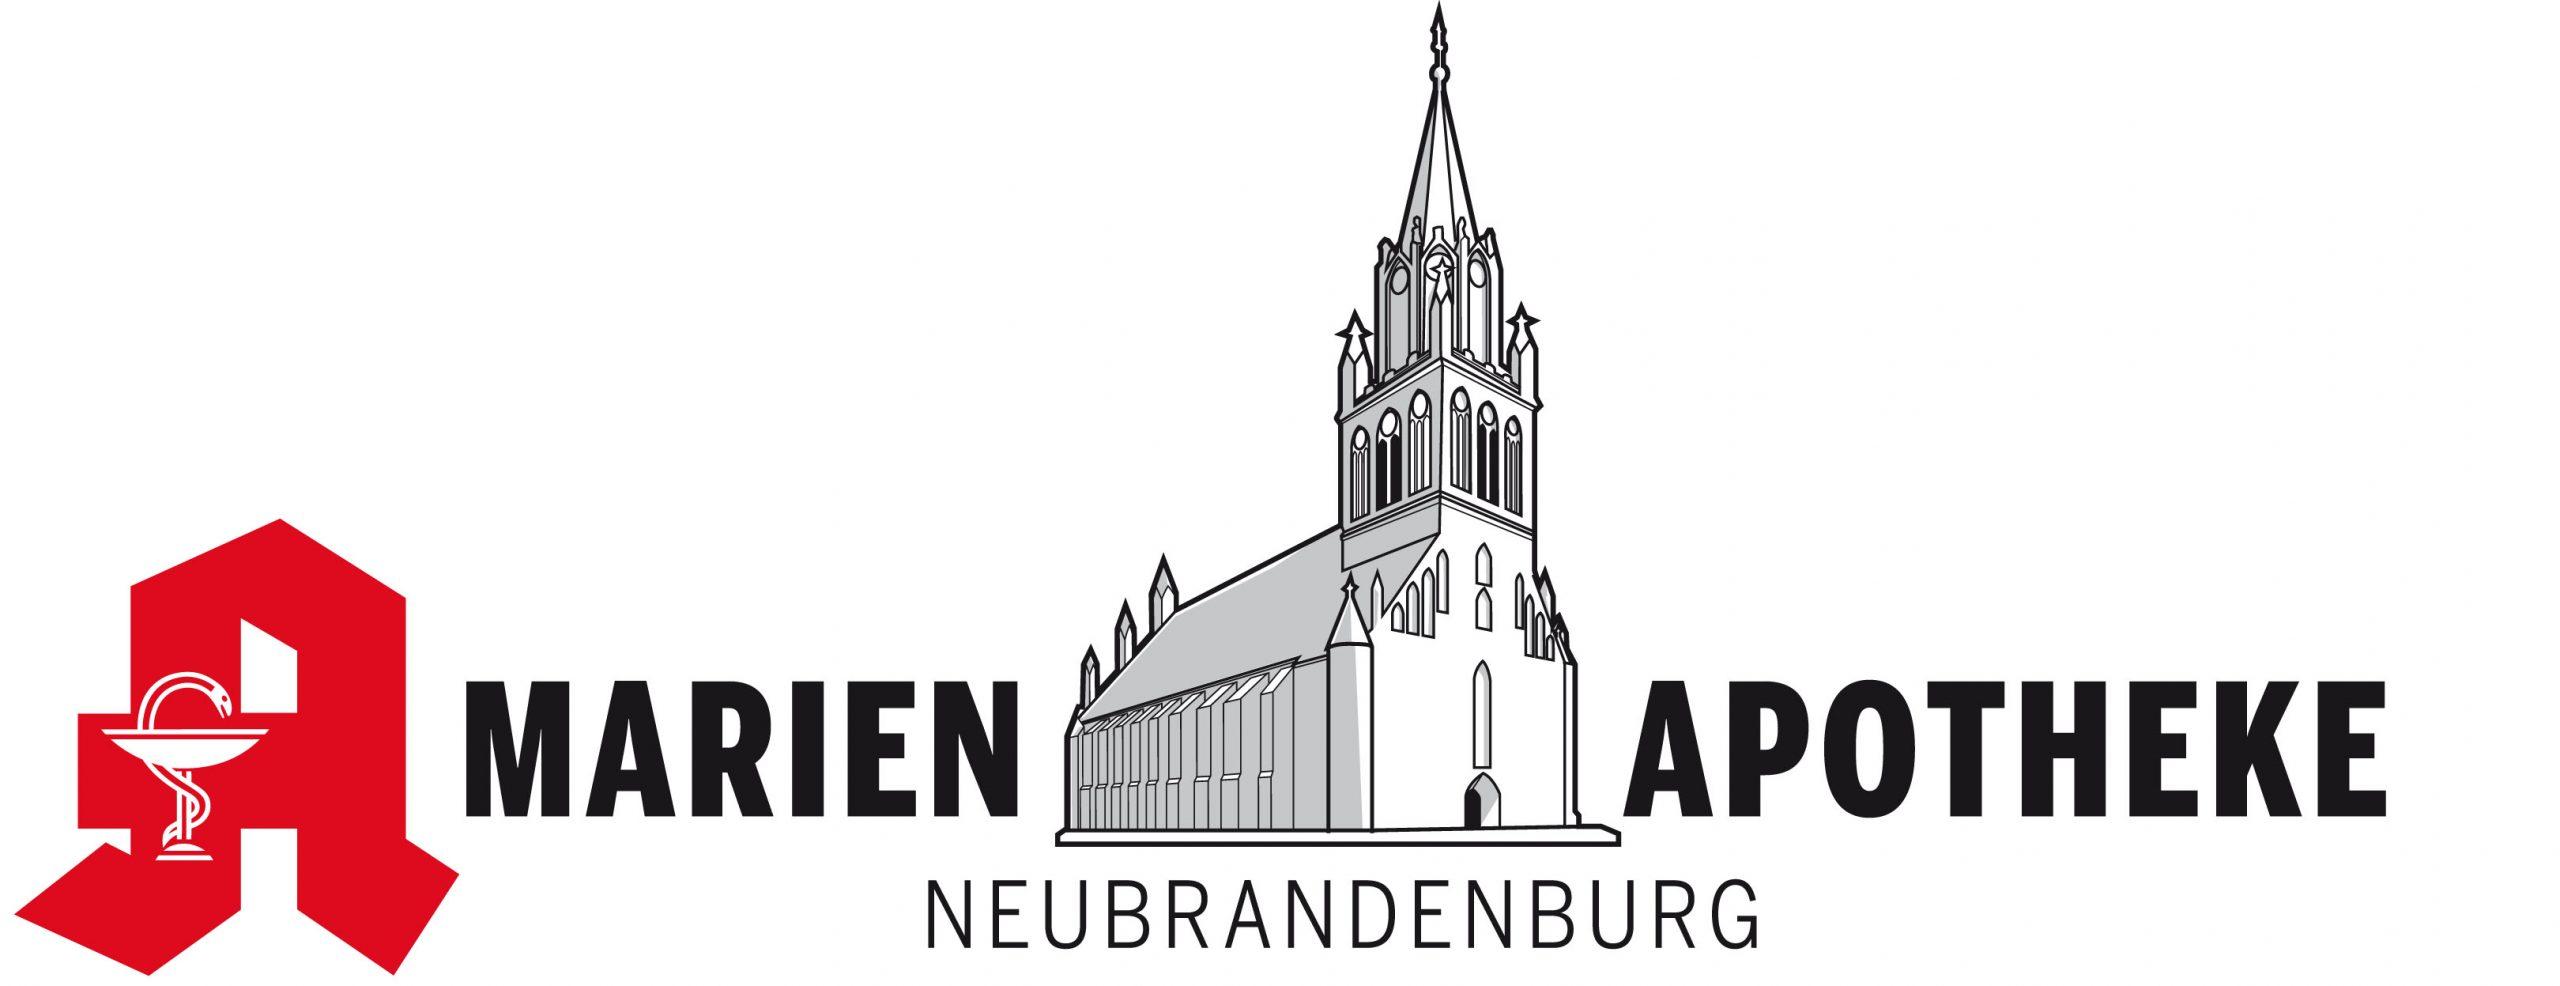 Marien Apotheke Neubrandenburg